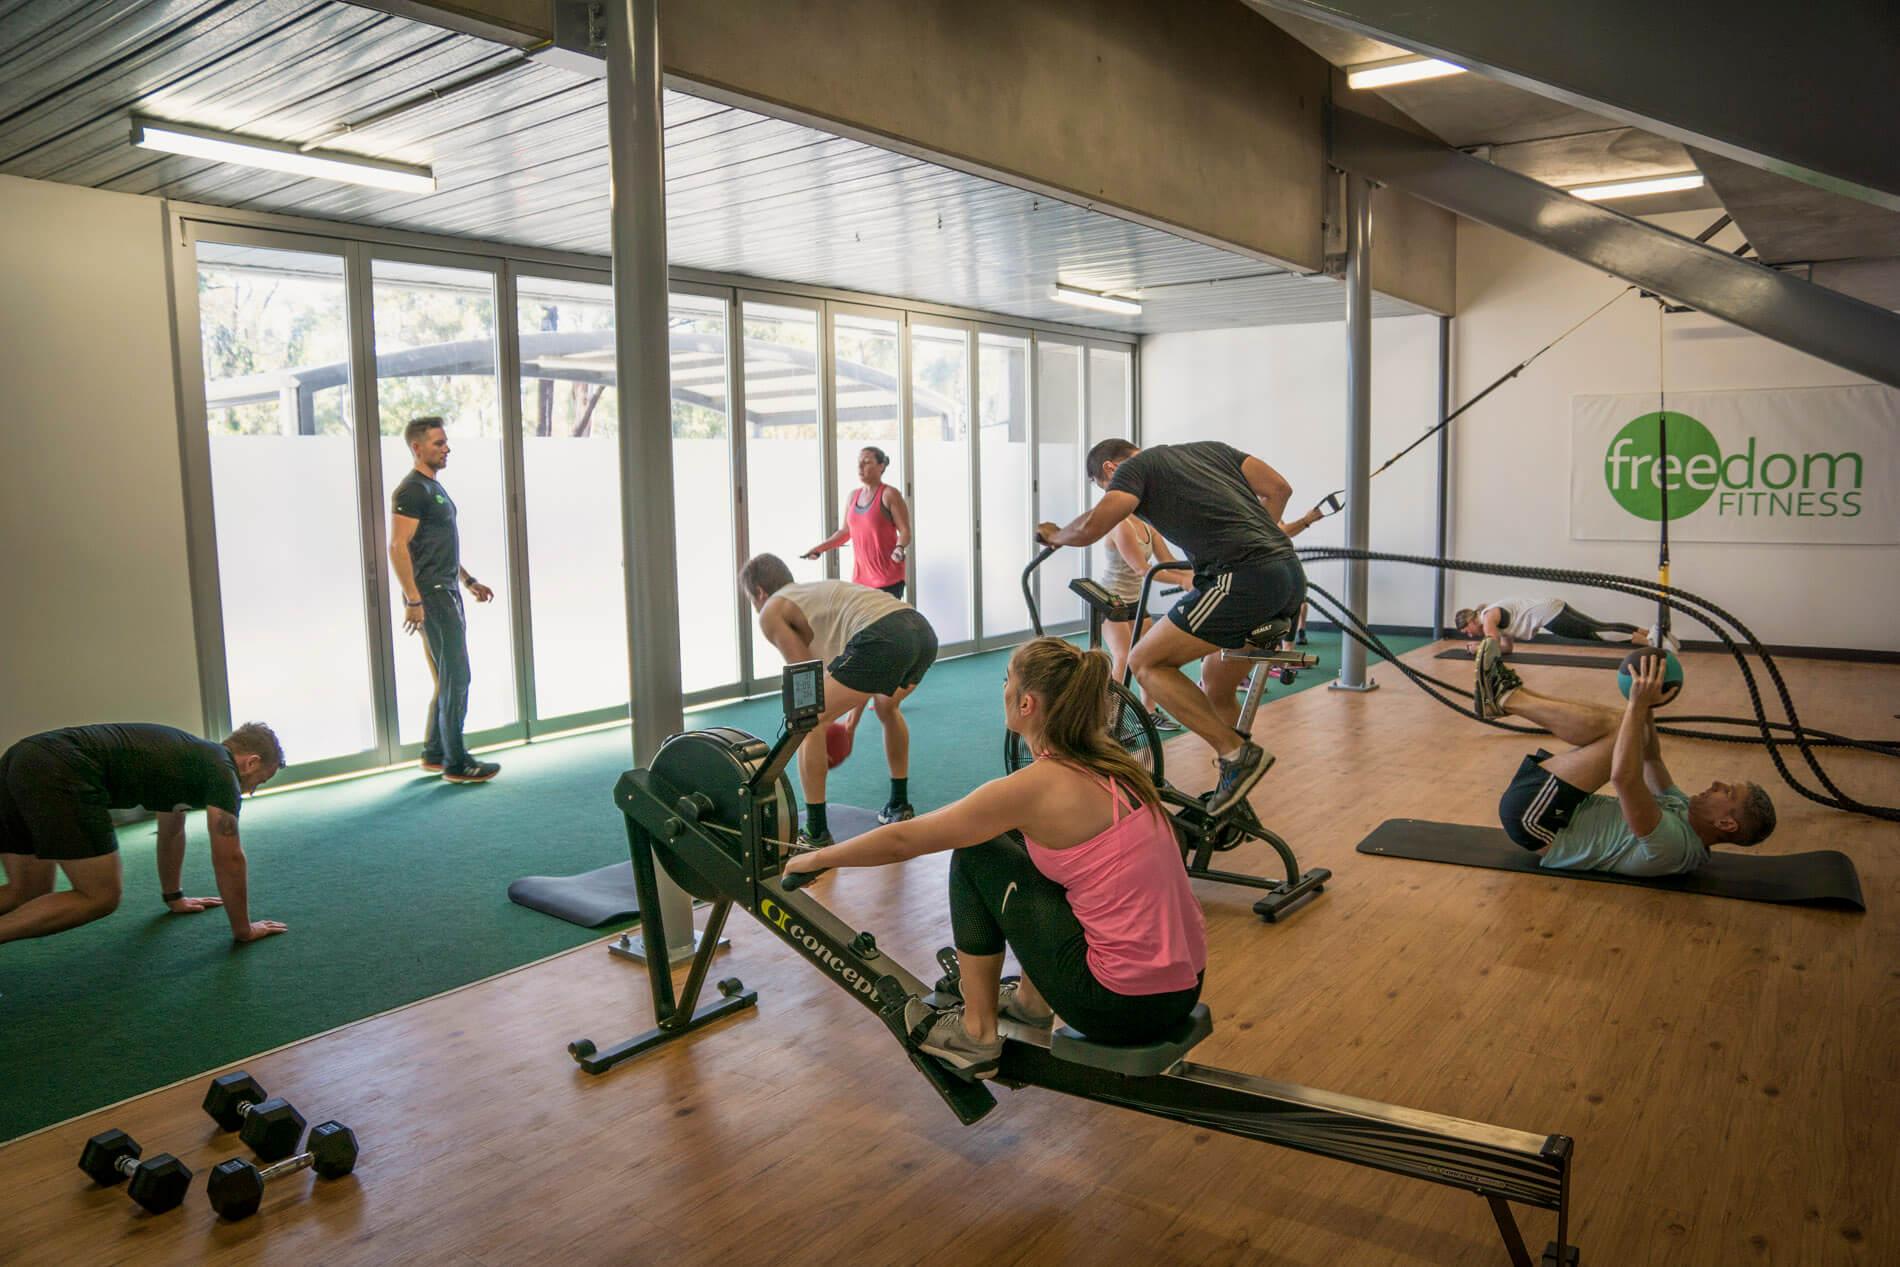 group-fitness-training-hobart-freedom-fitness-hobart-gym-near-me